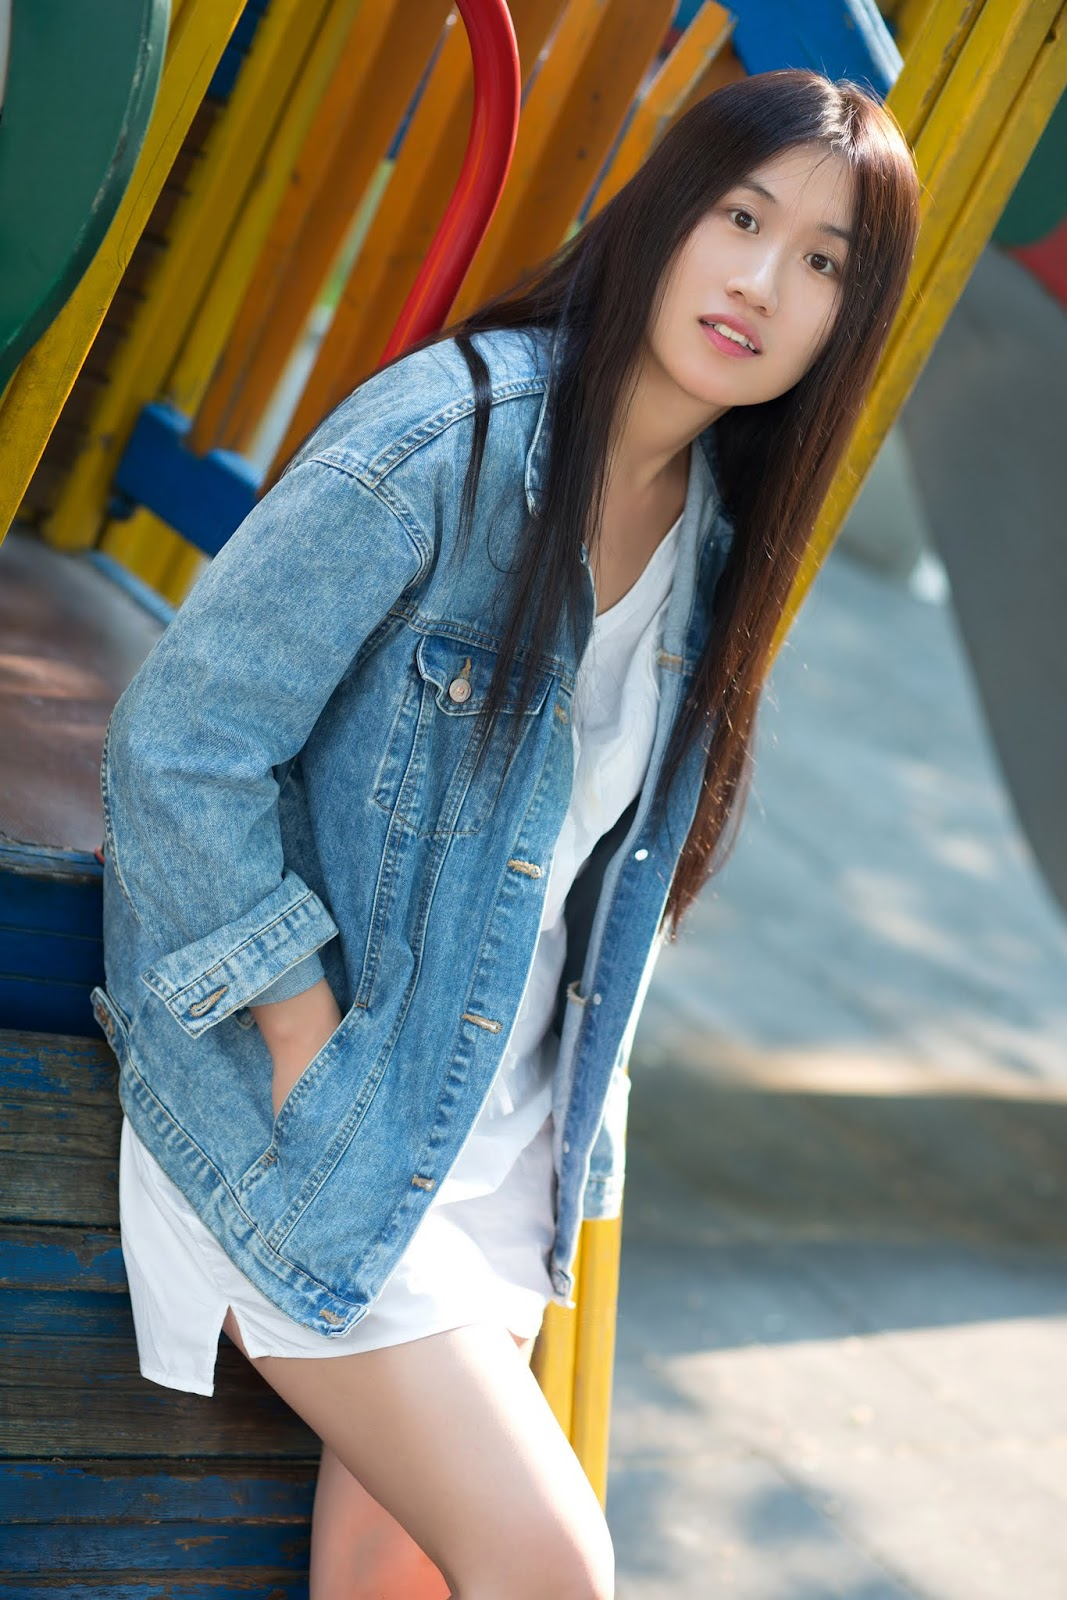 Jessica%2B%252810%2529 - TuiGirl No.60